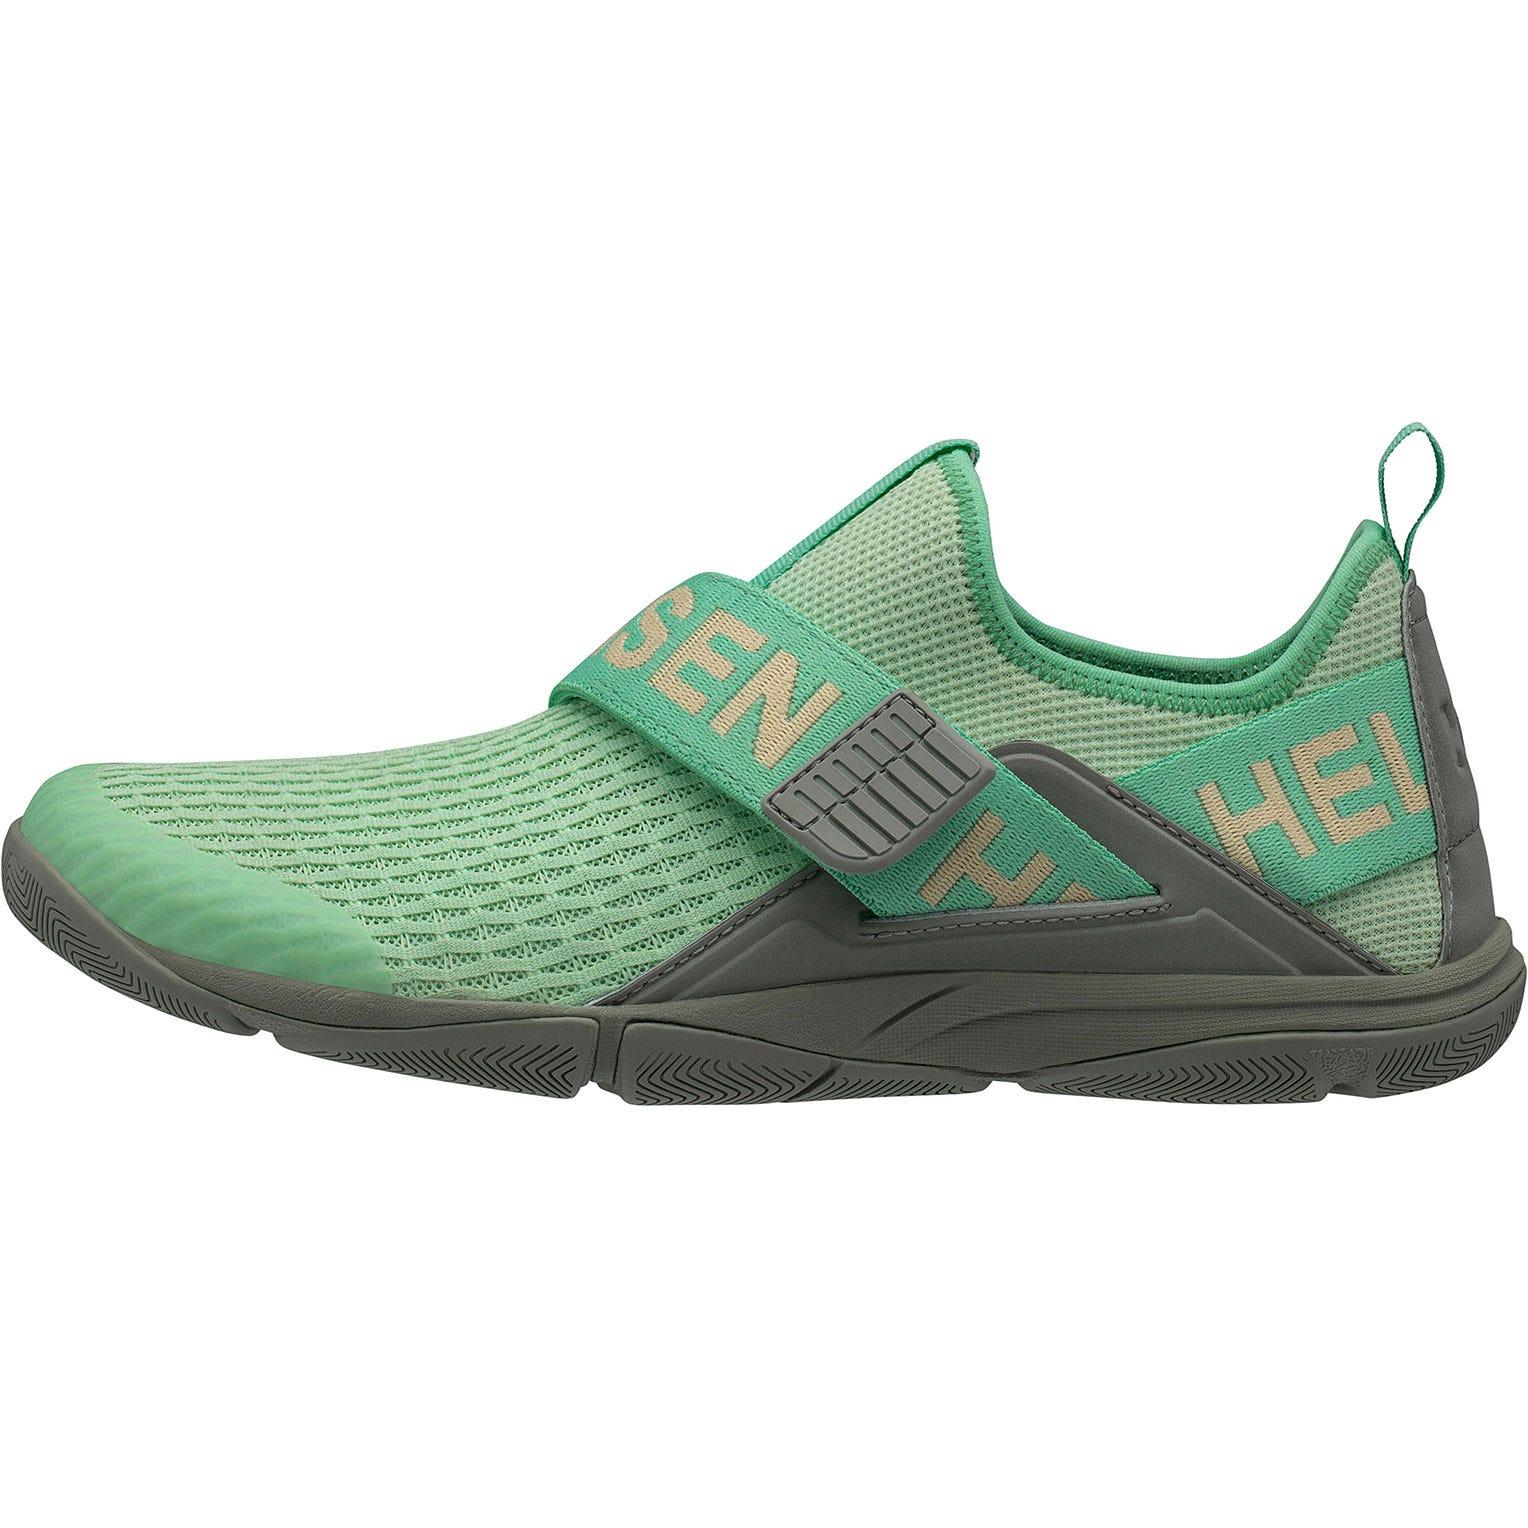 Helly Hansen W Hydromoc Slipon Shoe Womens Sailing Green 40/8.5